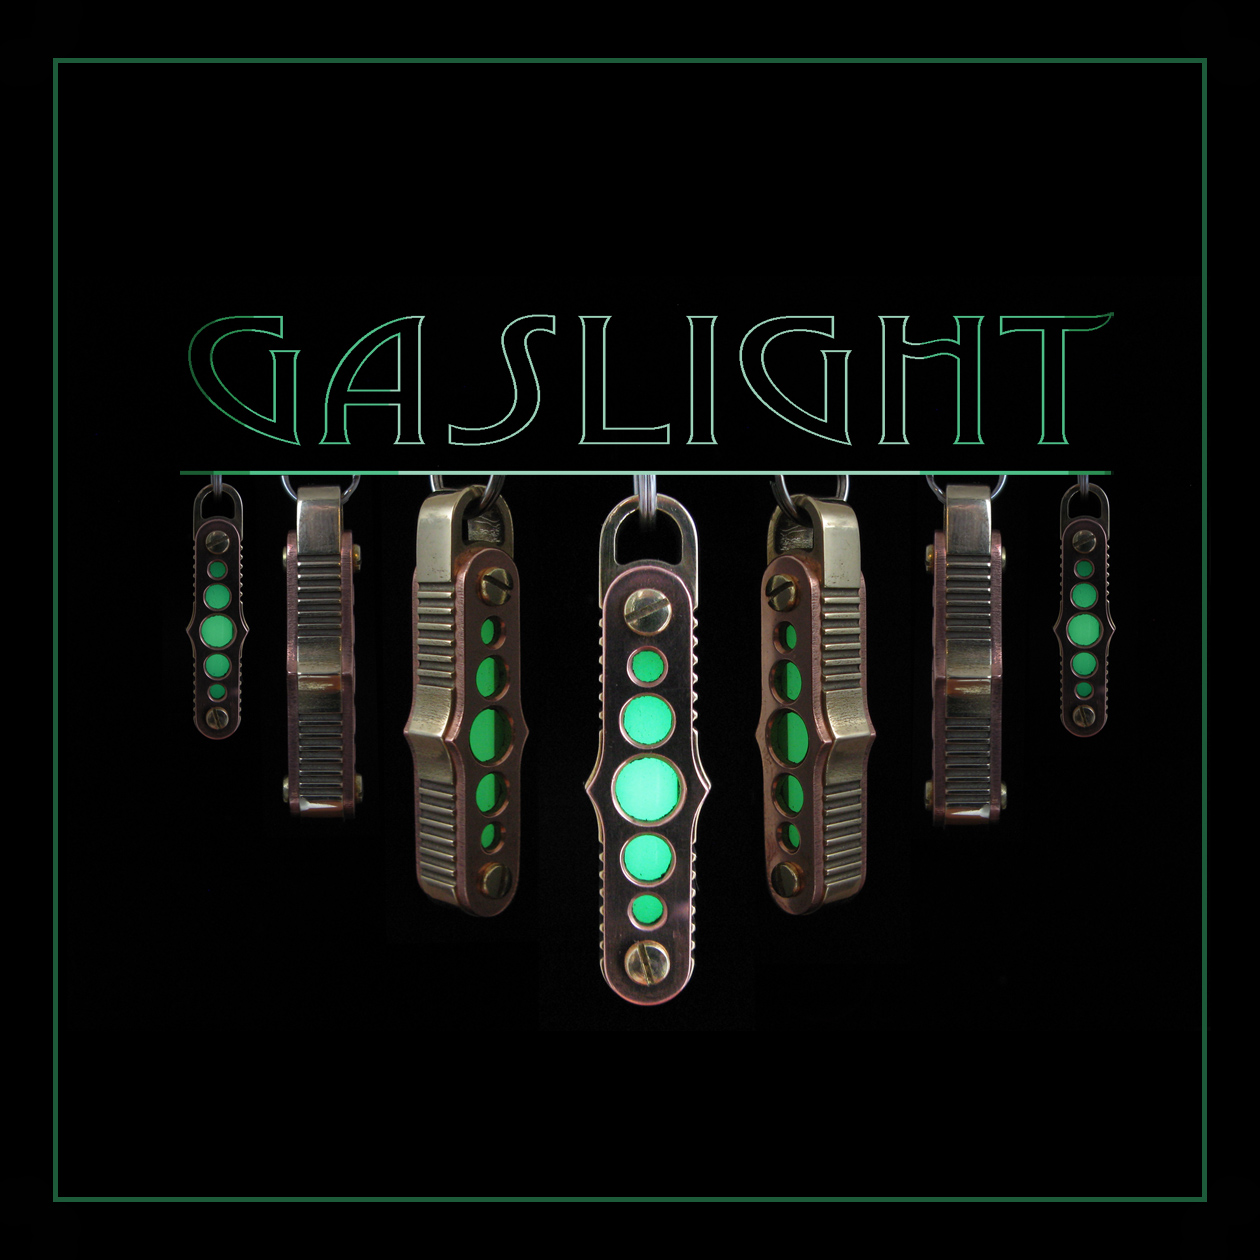 The GasLight keychain lantern : Go forth, be luminous!